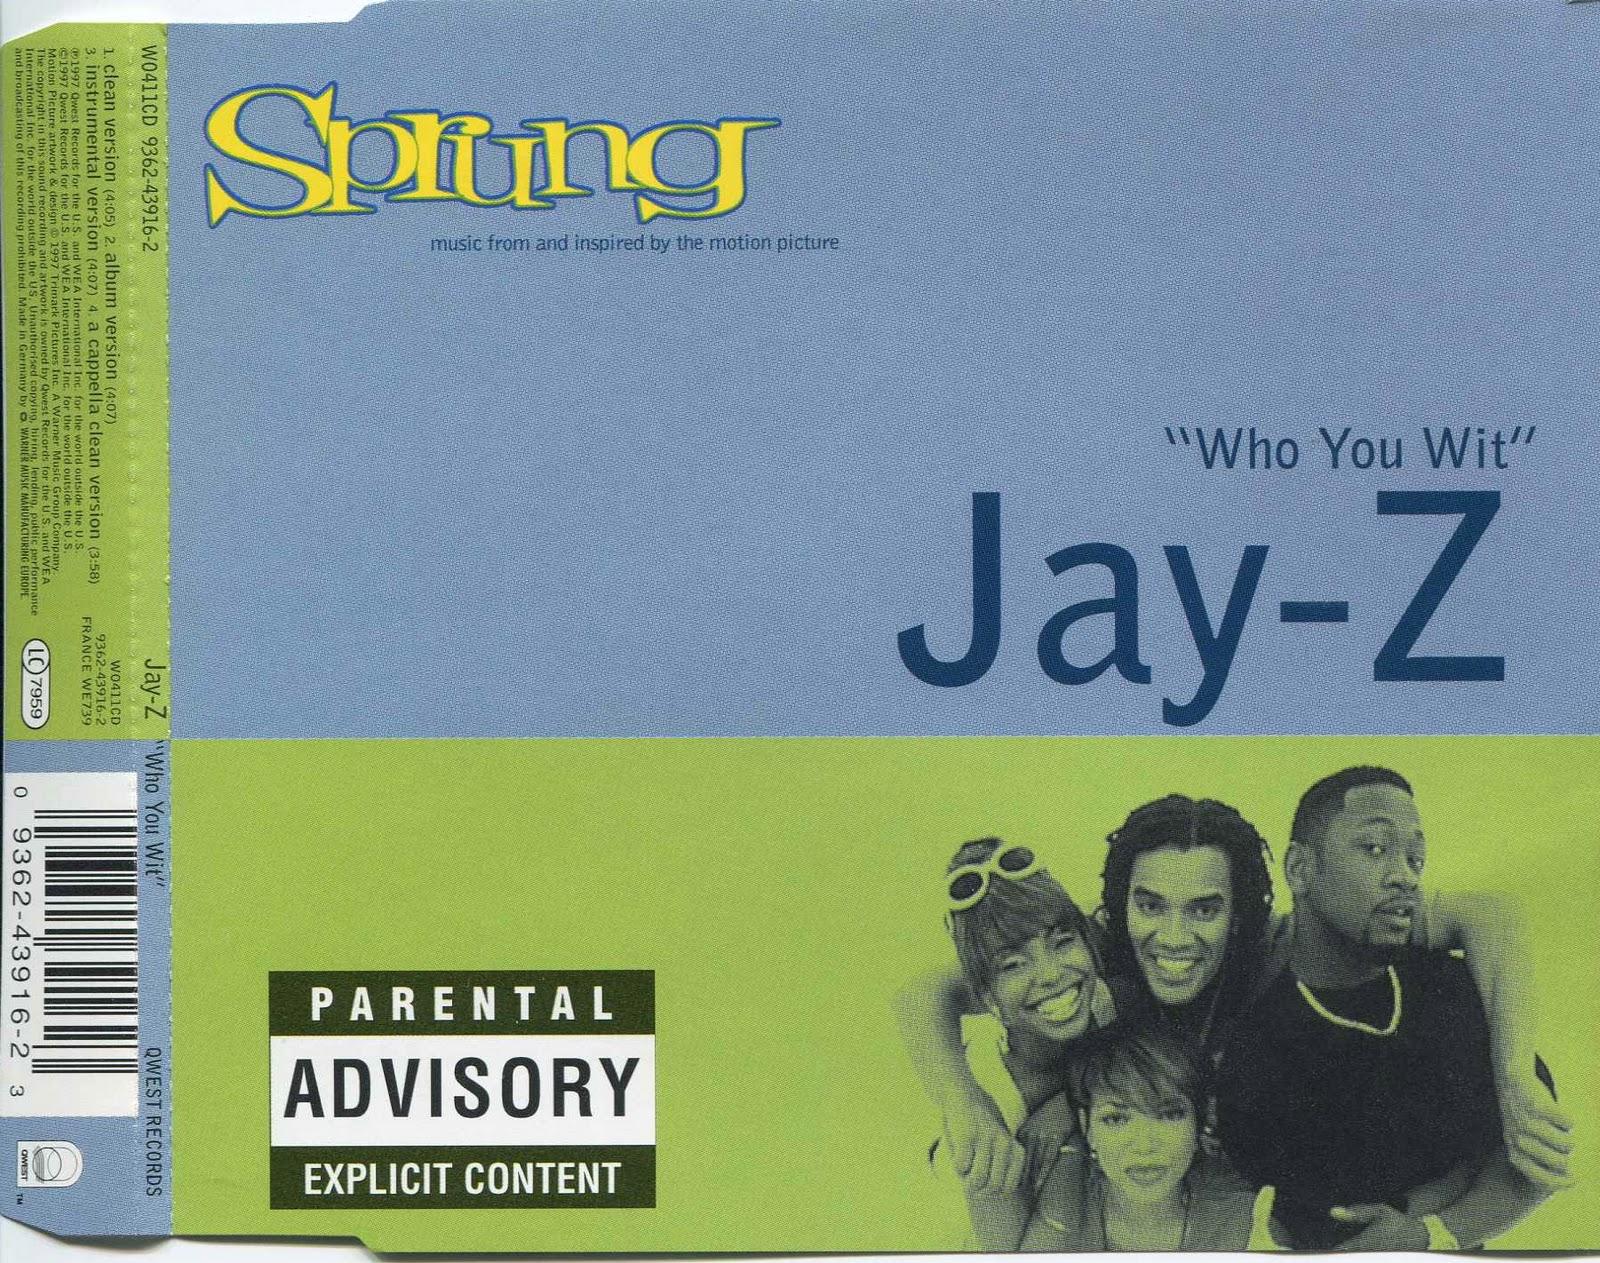 http://1.bp.blogspot.com/-pc3fa2fRXNM/TVyFNNmhBhI/AAAAAAAAAhc/mrEBQsibQDg/s1600/Jay-ZWhoFR.jpg